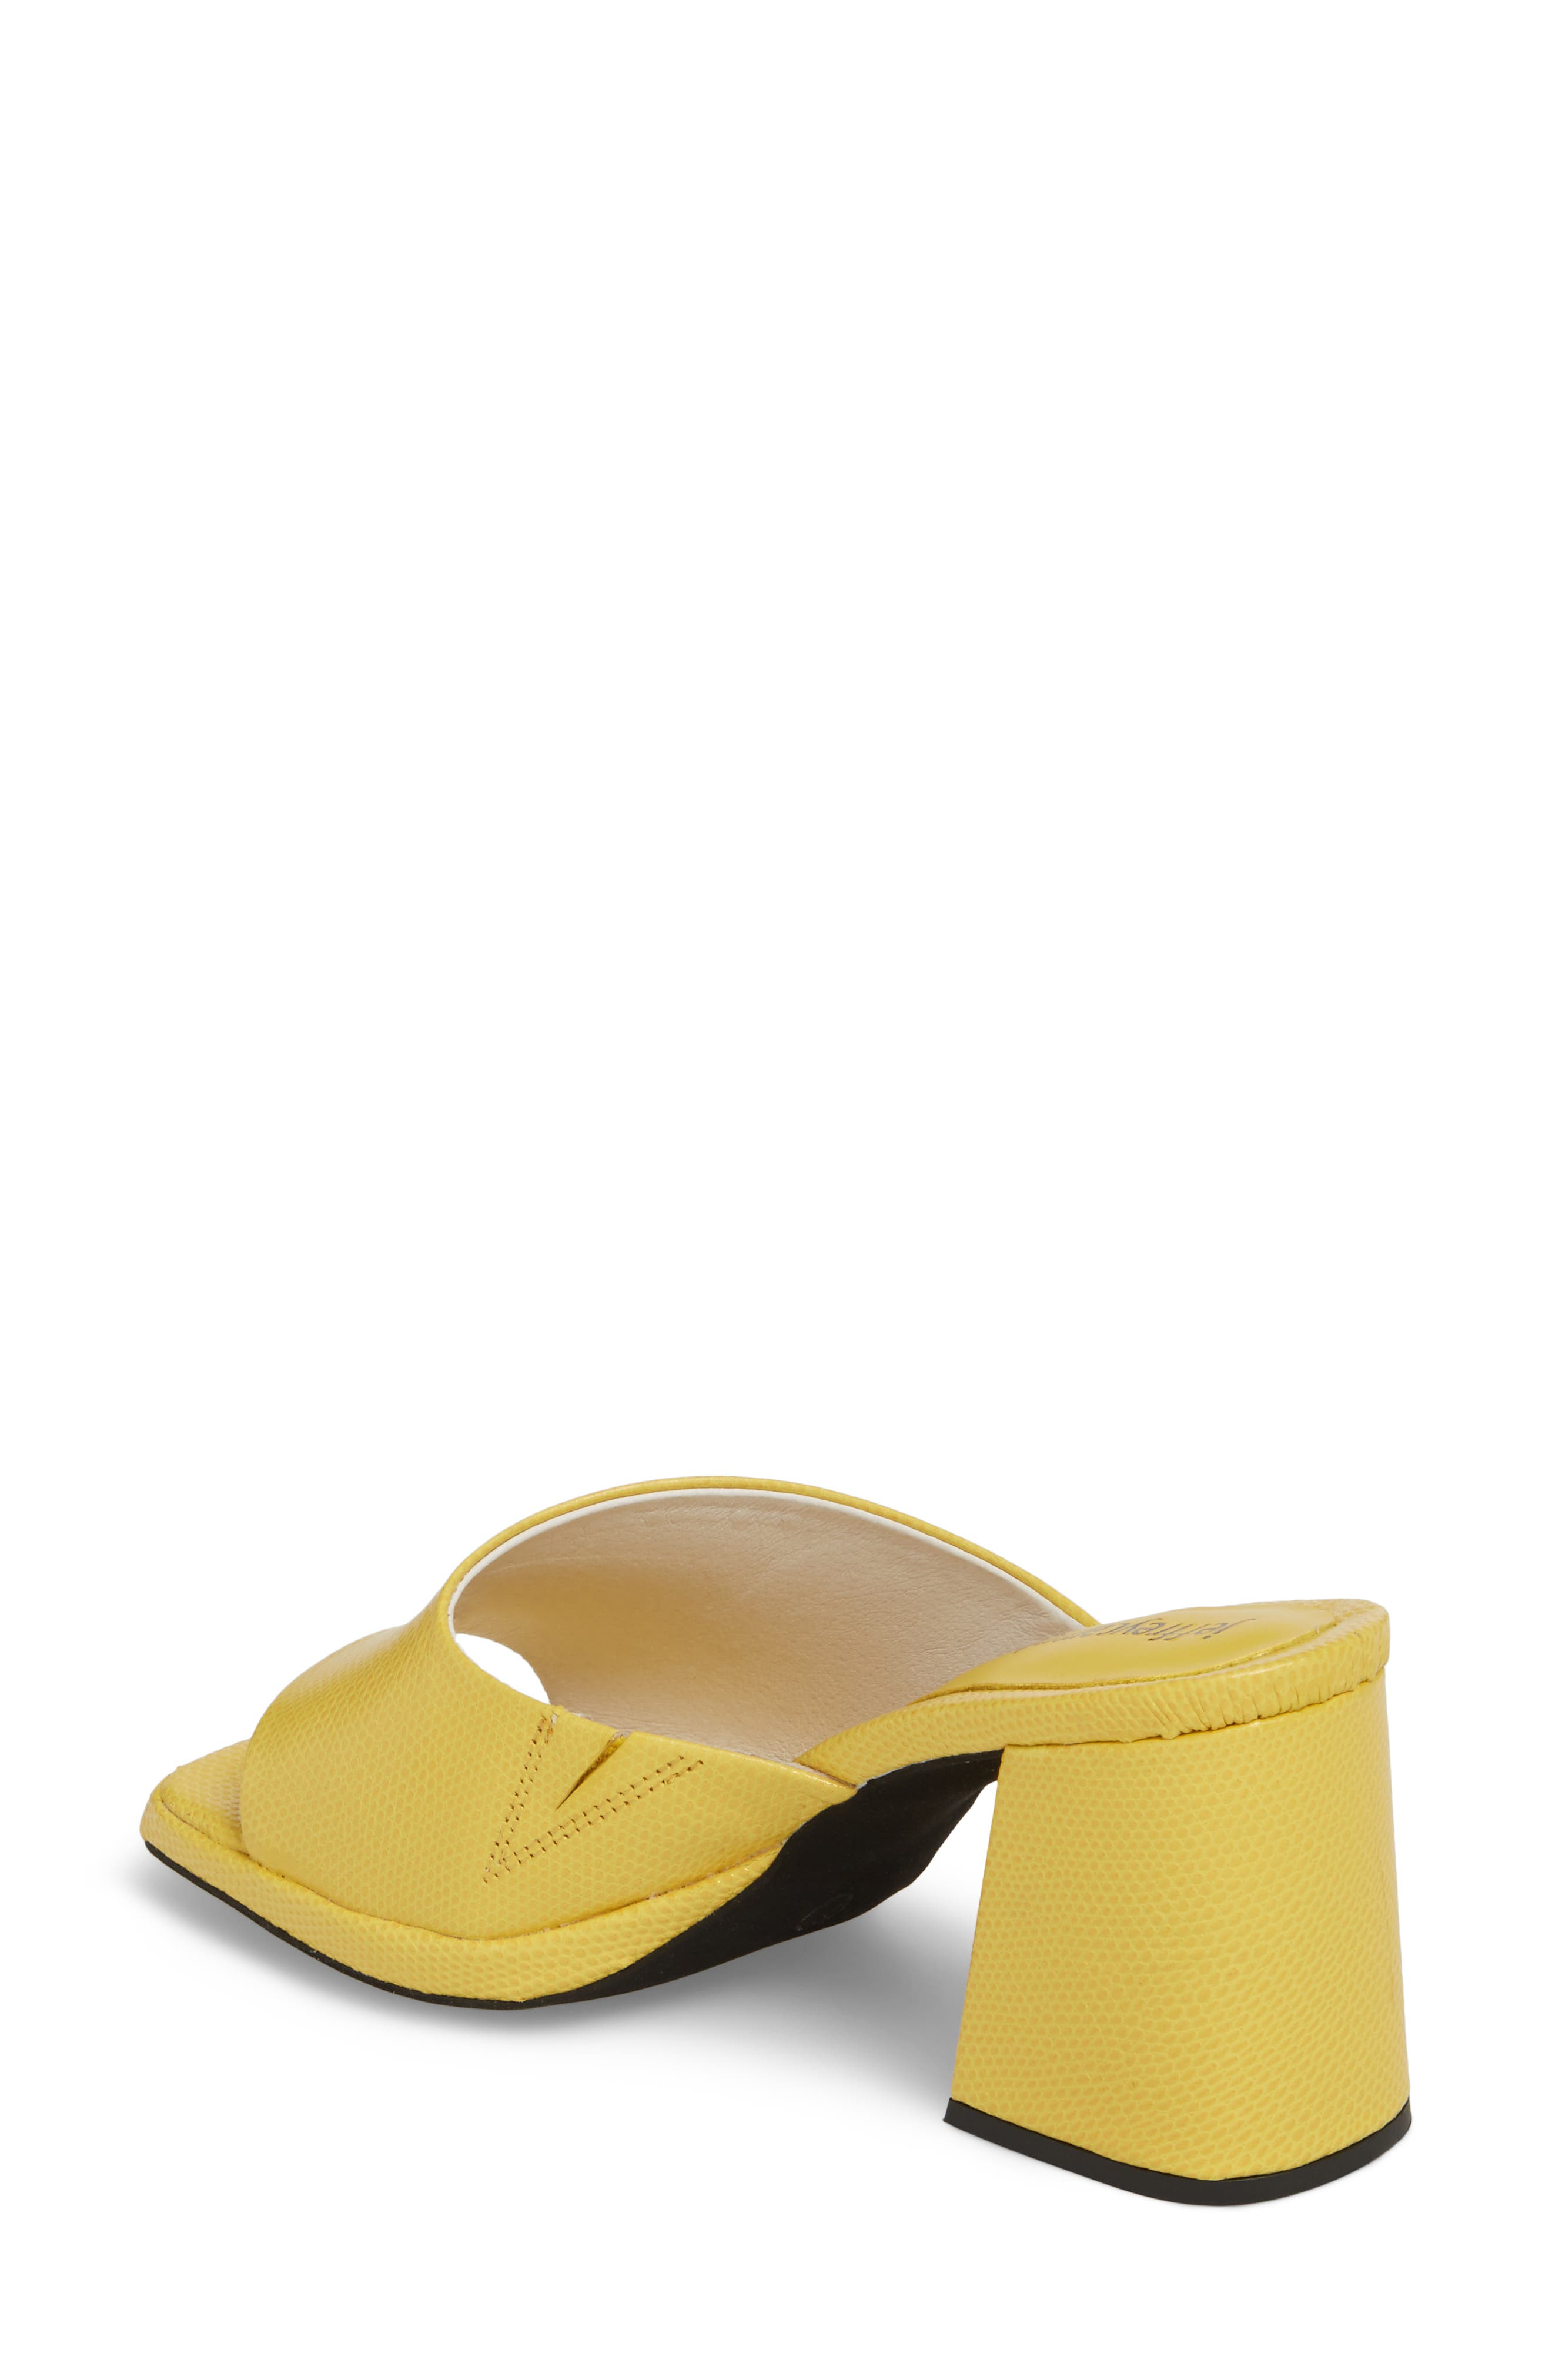 Suzuci Sandal,                             Alternate thumbnail 2, color,                             Yellow Leather